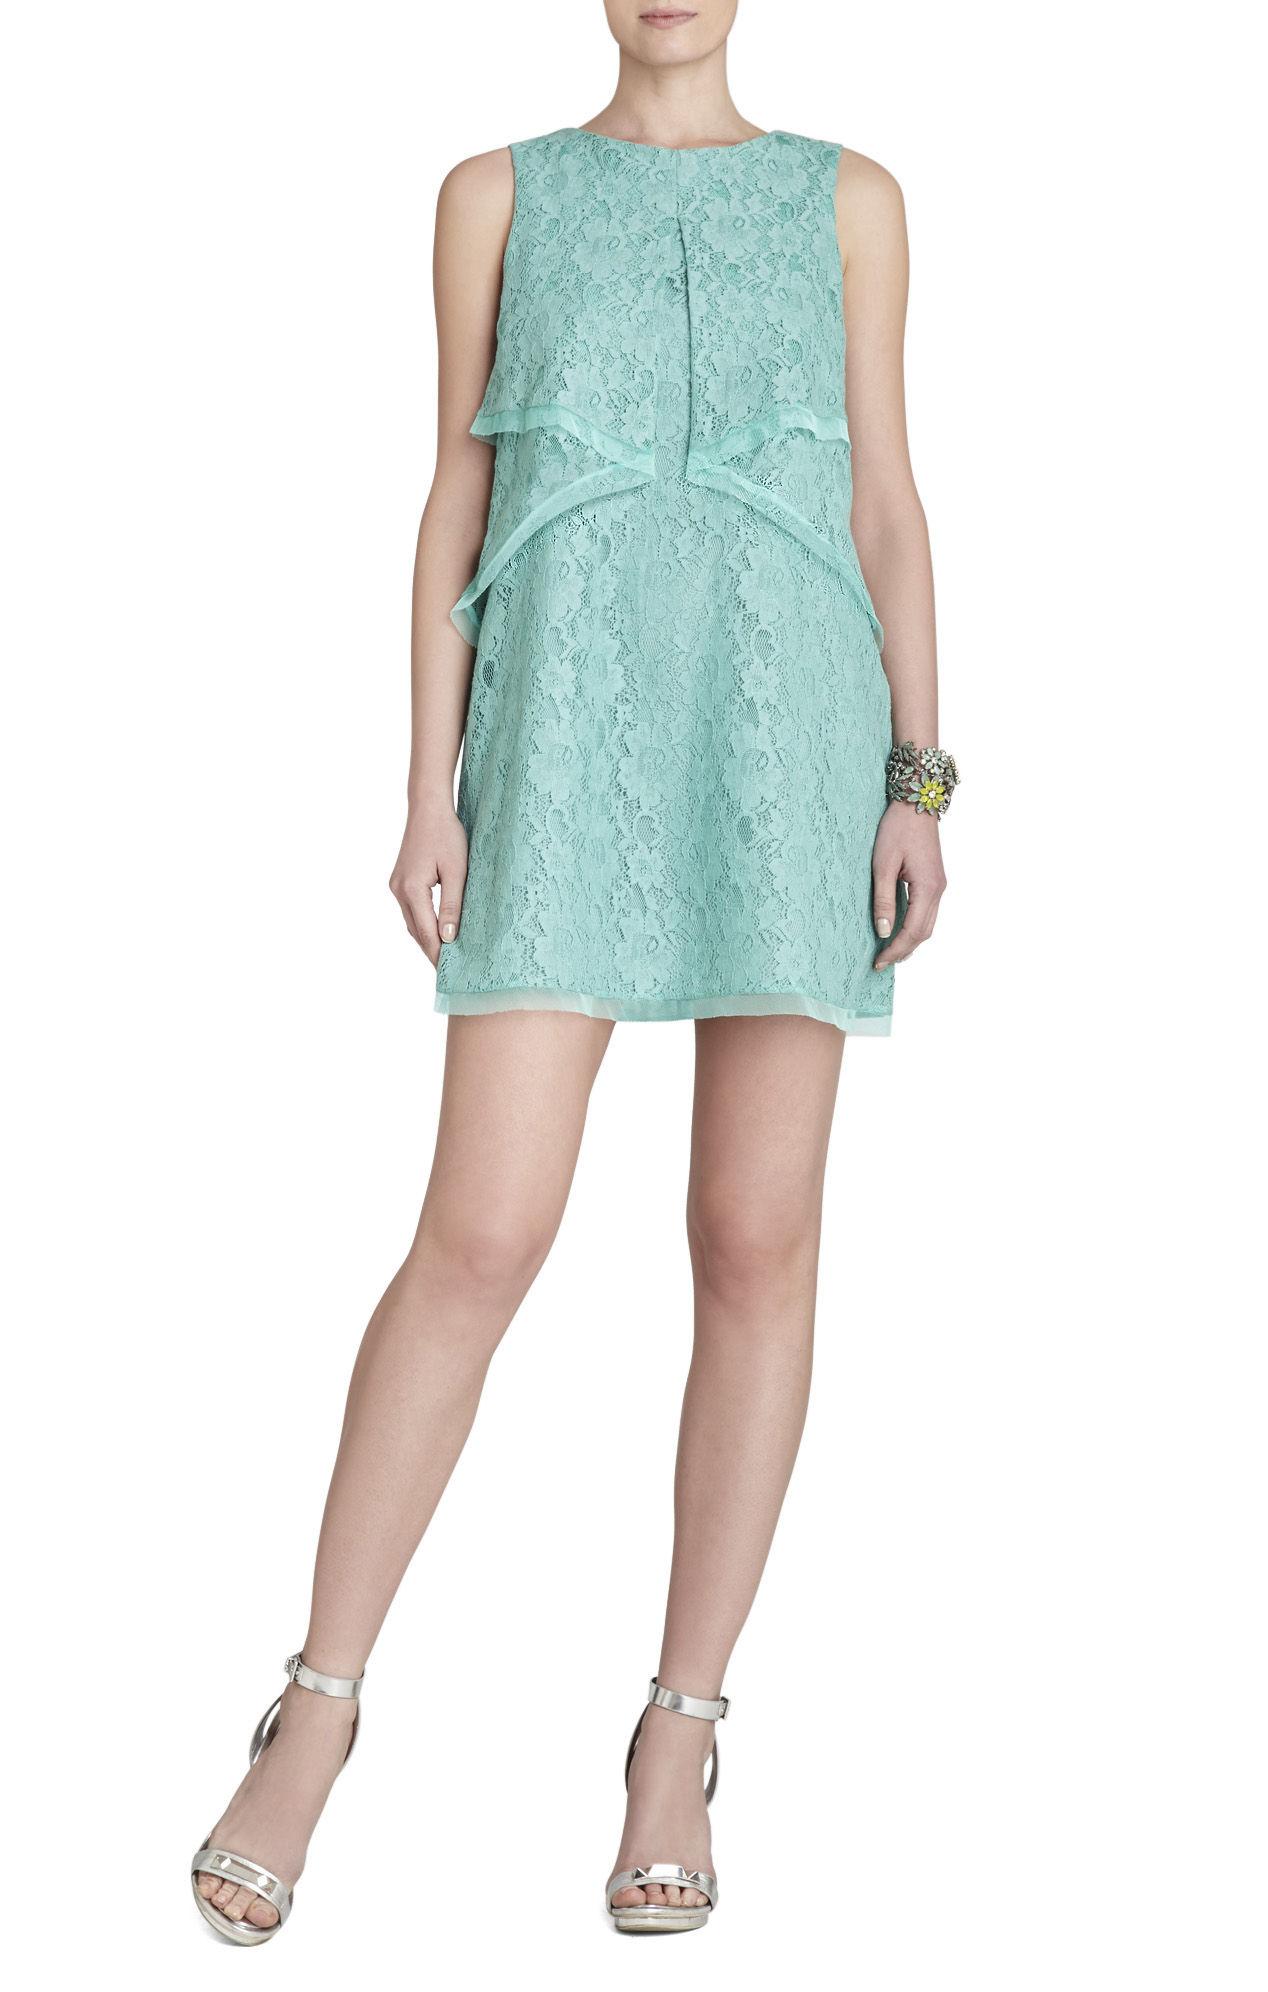 Lyst - Bcbgmaxazria Amelie Draped Sleeveless Lace Dress in Blue